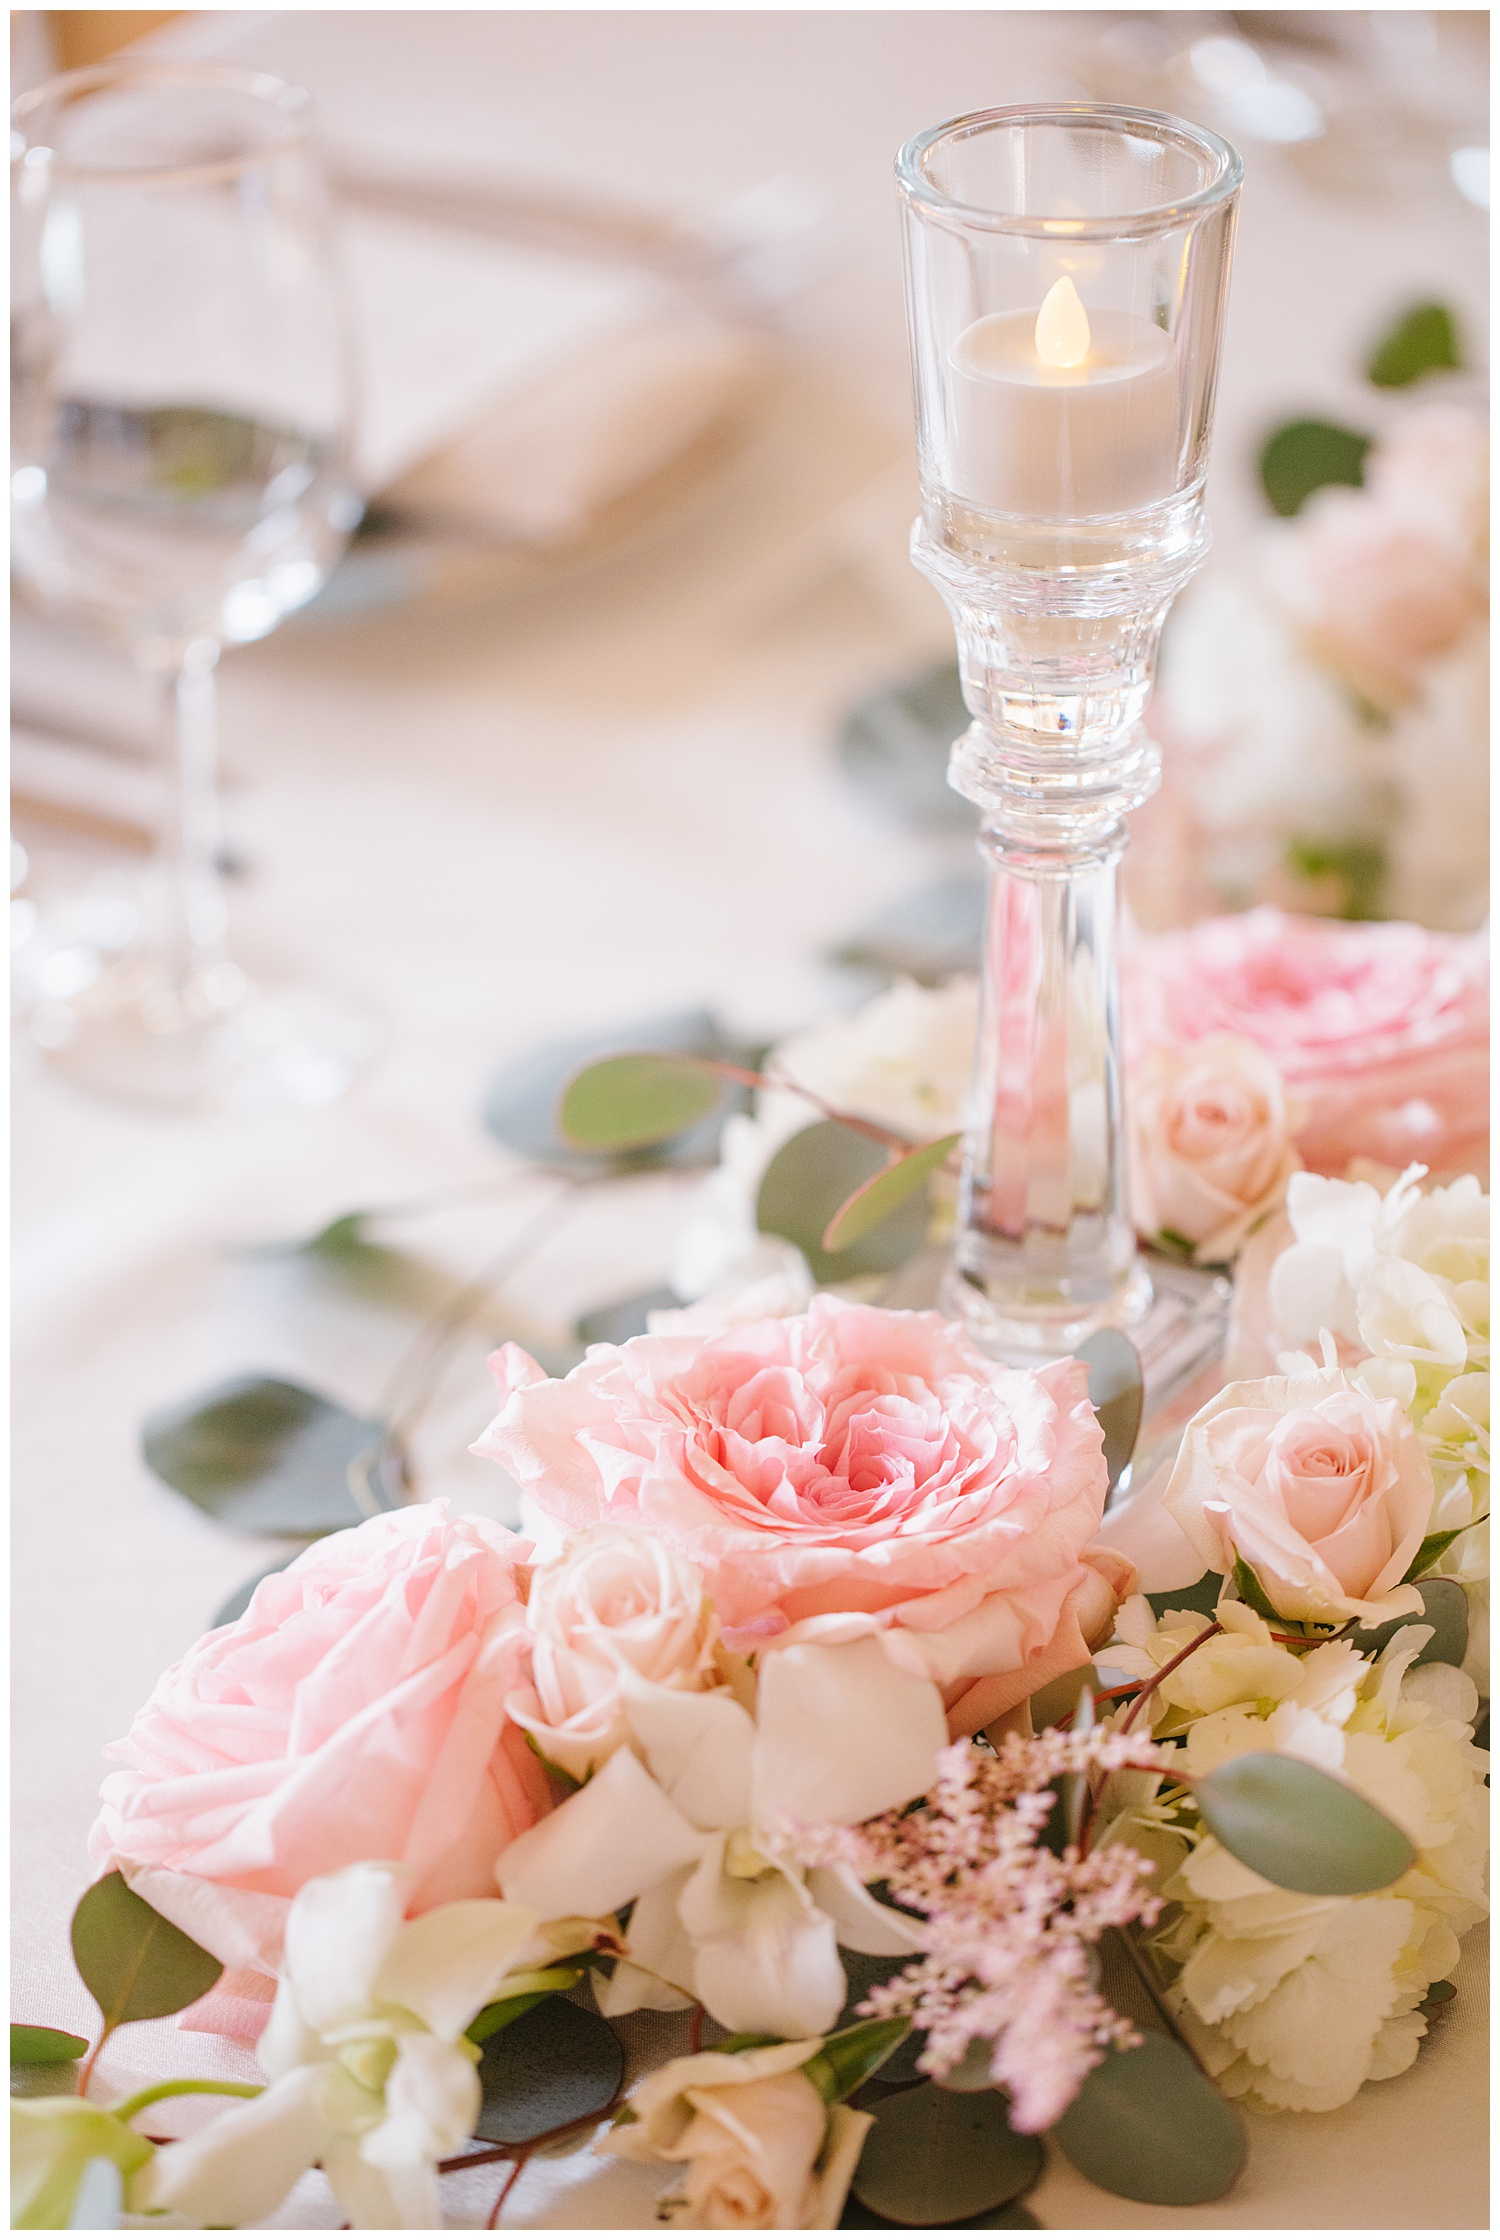 Stephen_Nathalie_Rosecliff_Mansion_Wedding_019.jpeg